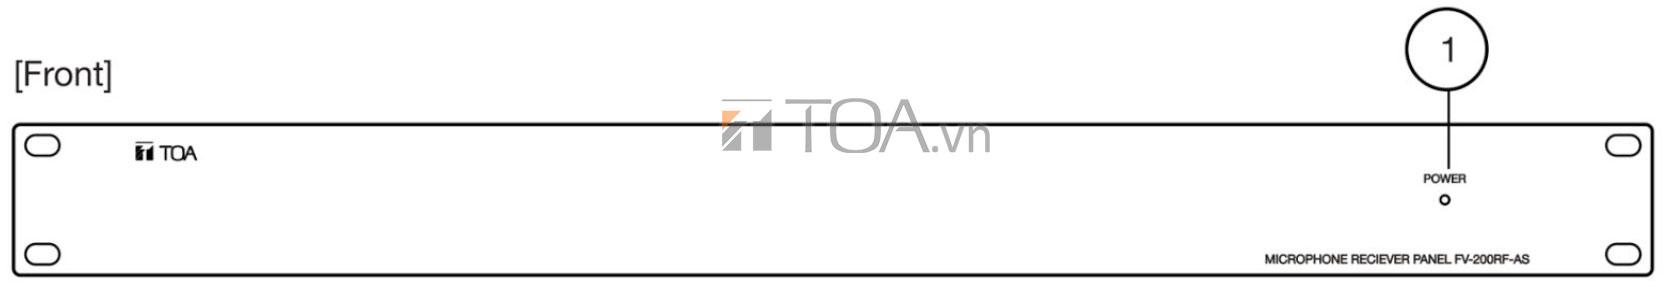 BỘ GIAO TIẾP MICRO CHỌN VÙNG TOA FV-200RF-AS, TOA FV-200RF-AS